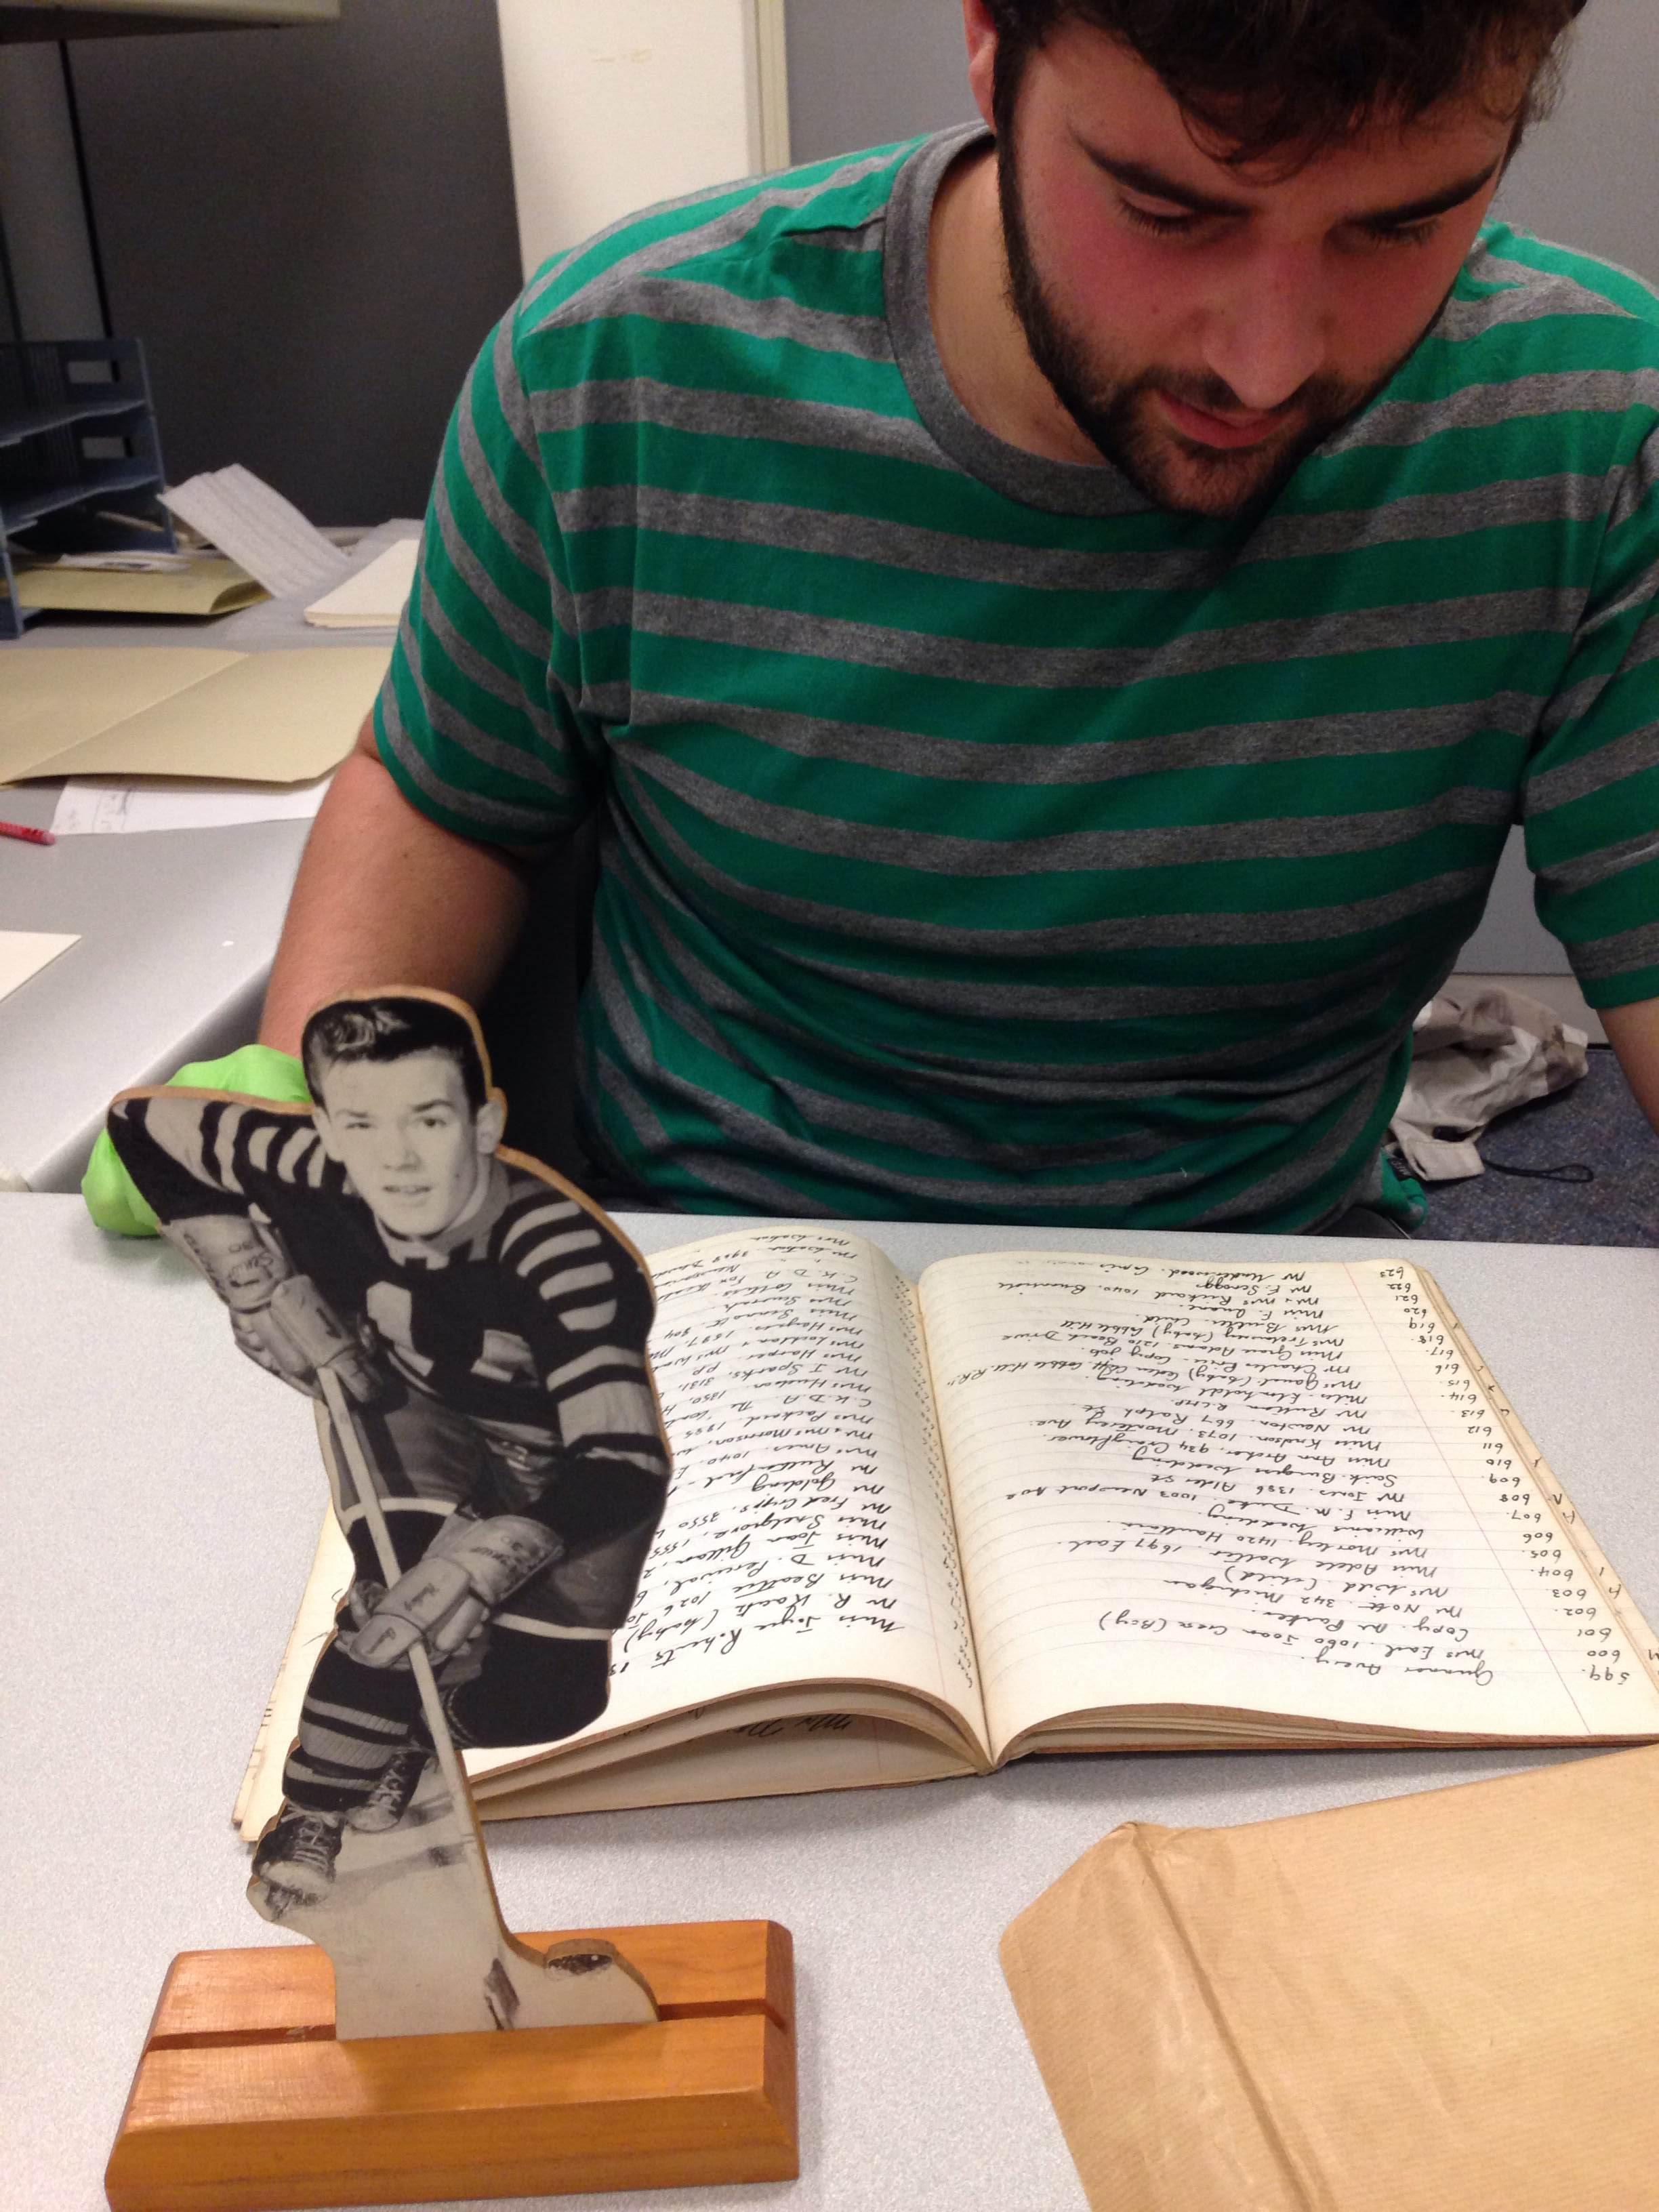 Sam processing Goertz_hockey player and order book